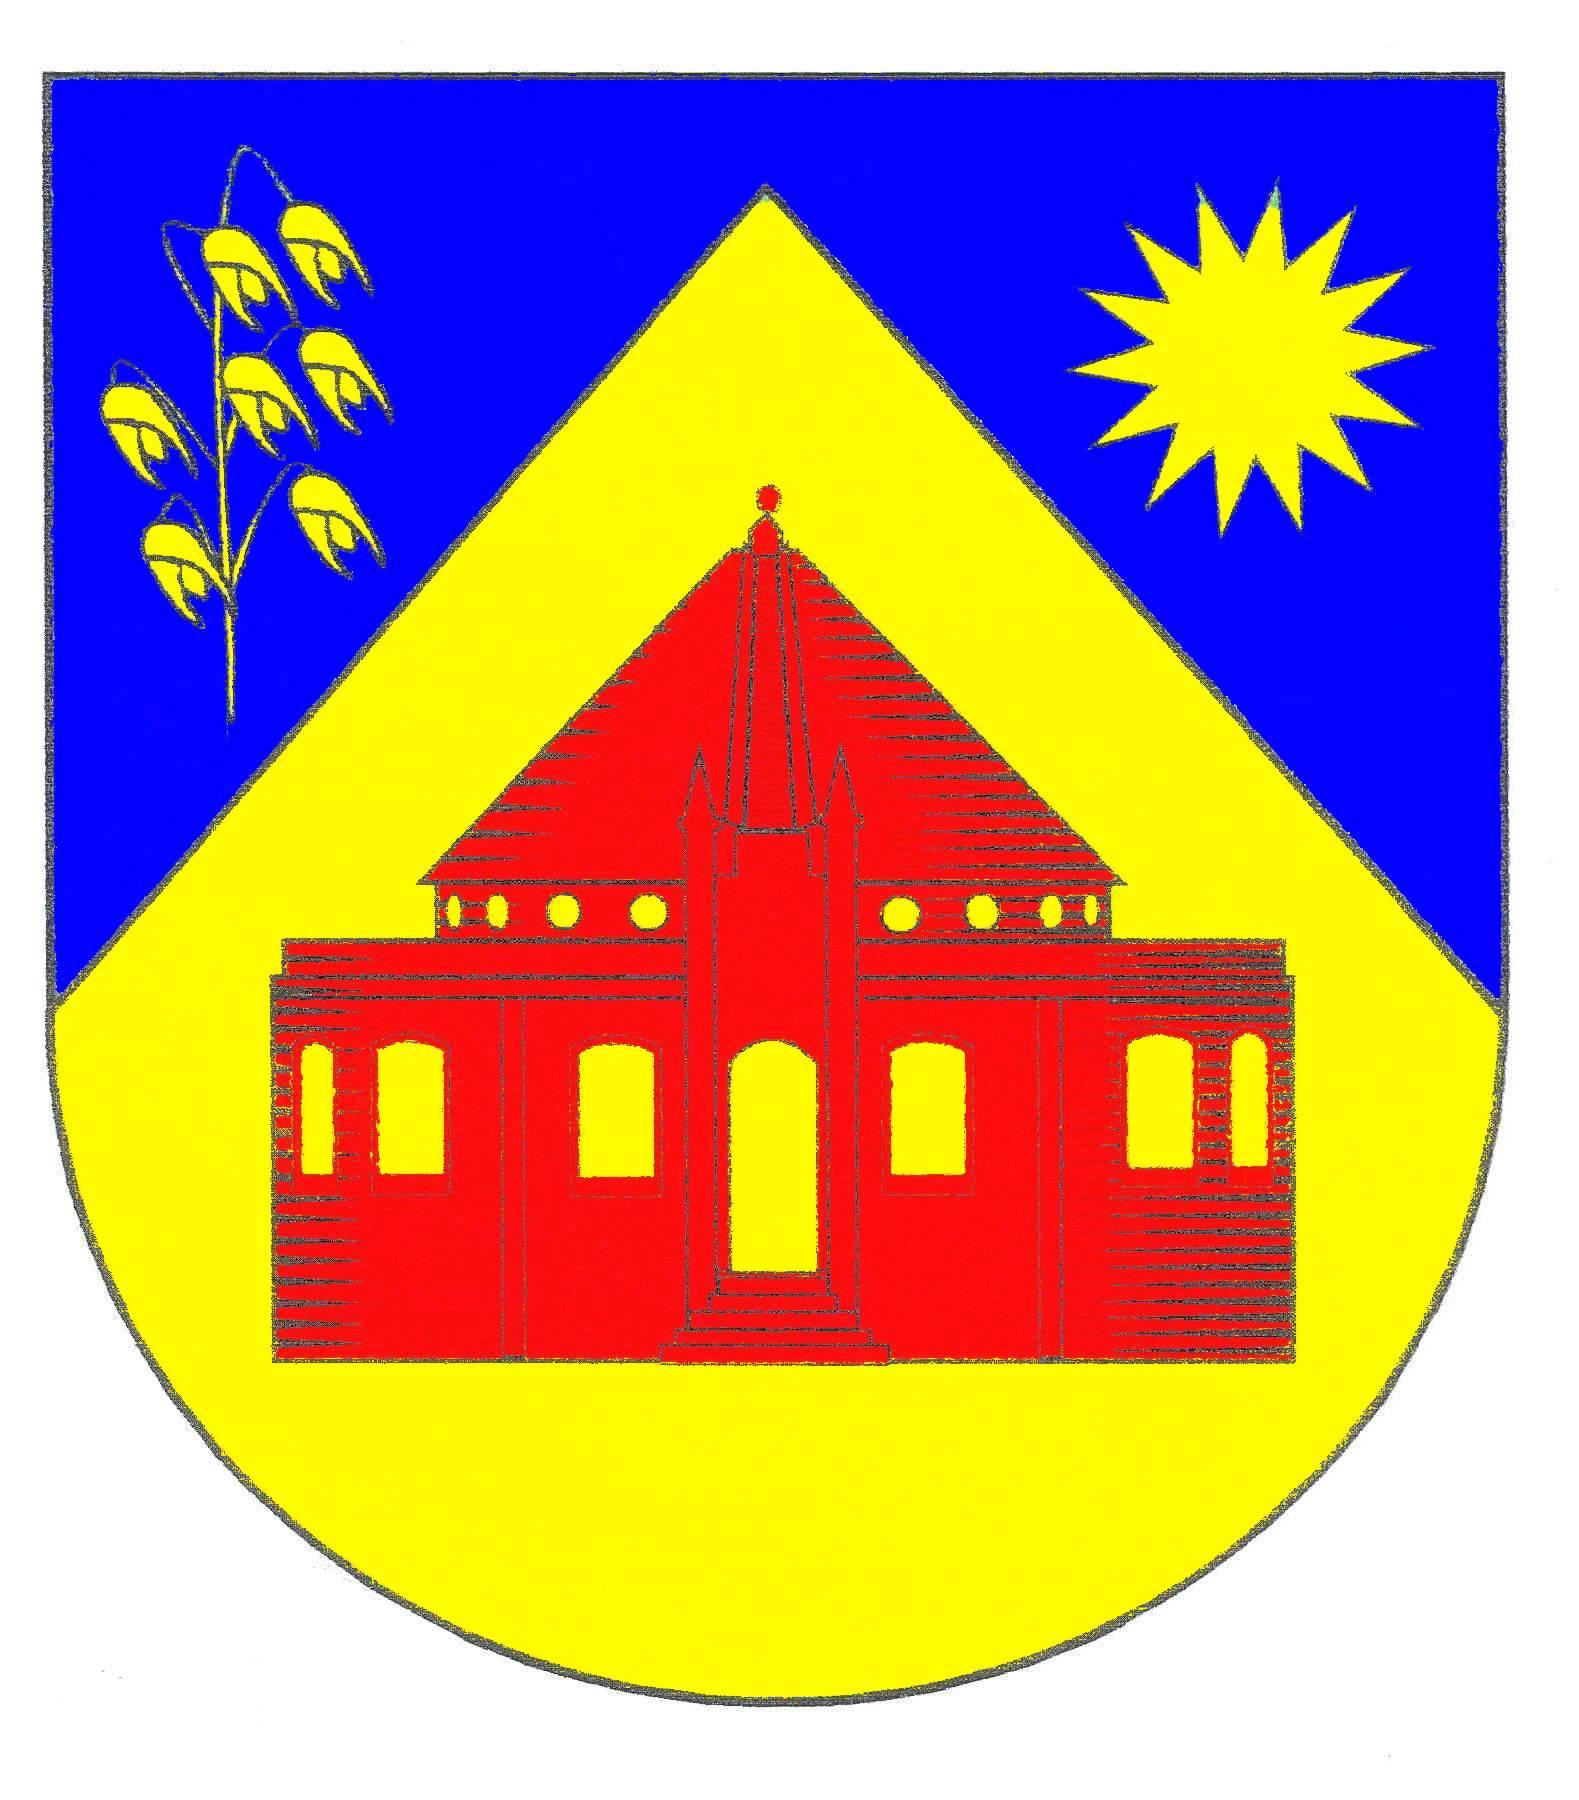 Wappen GemeindeBothkamp, Kreis Plön